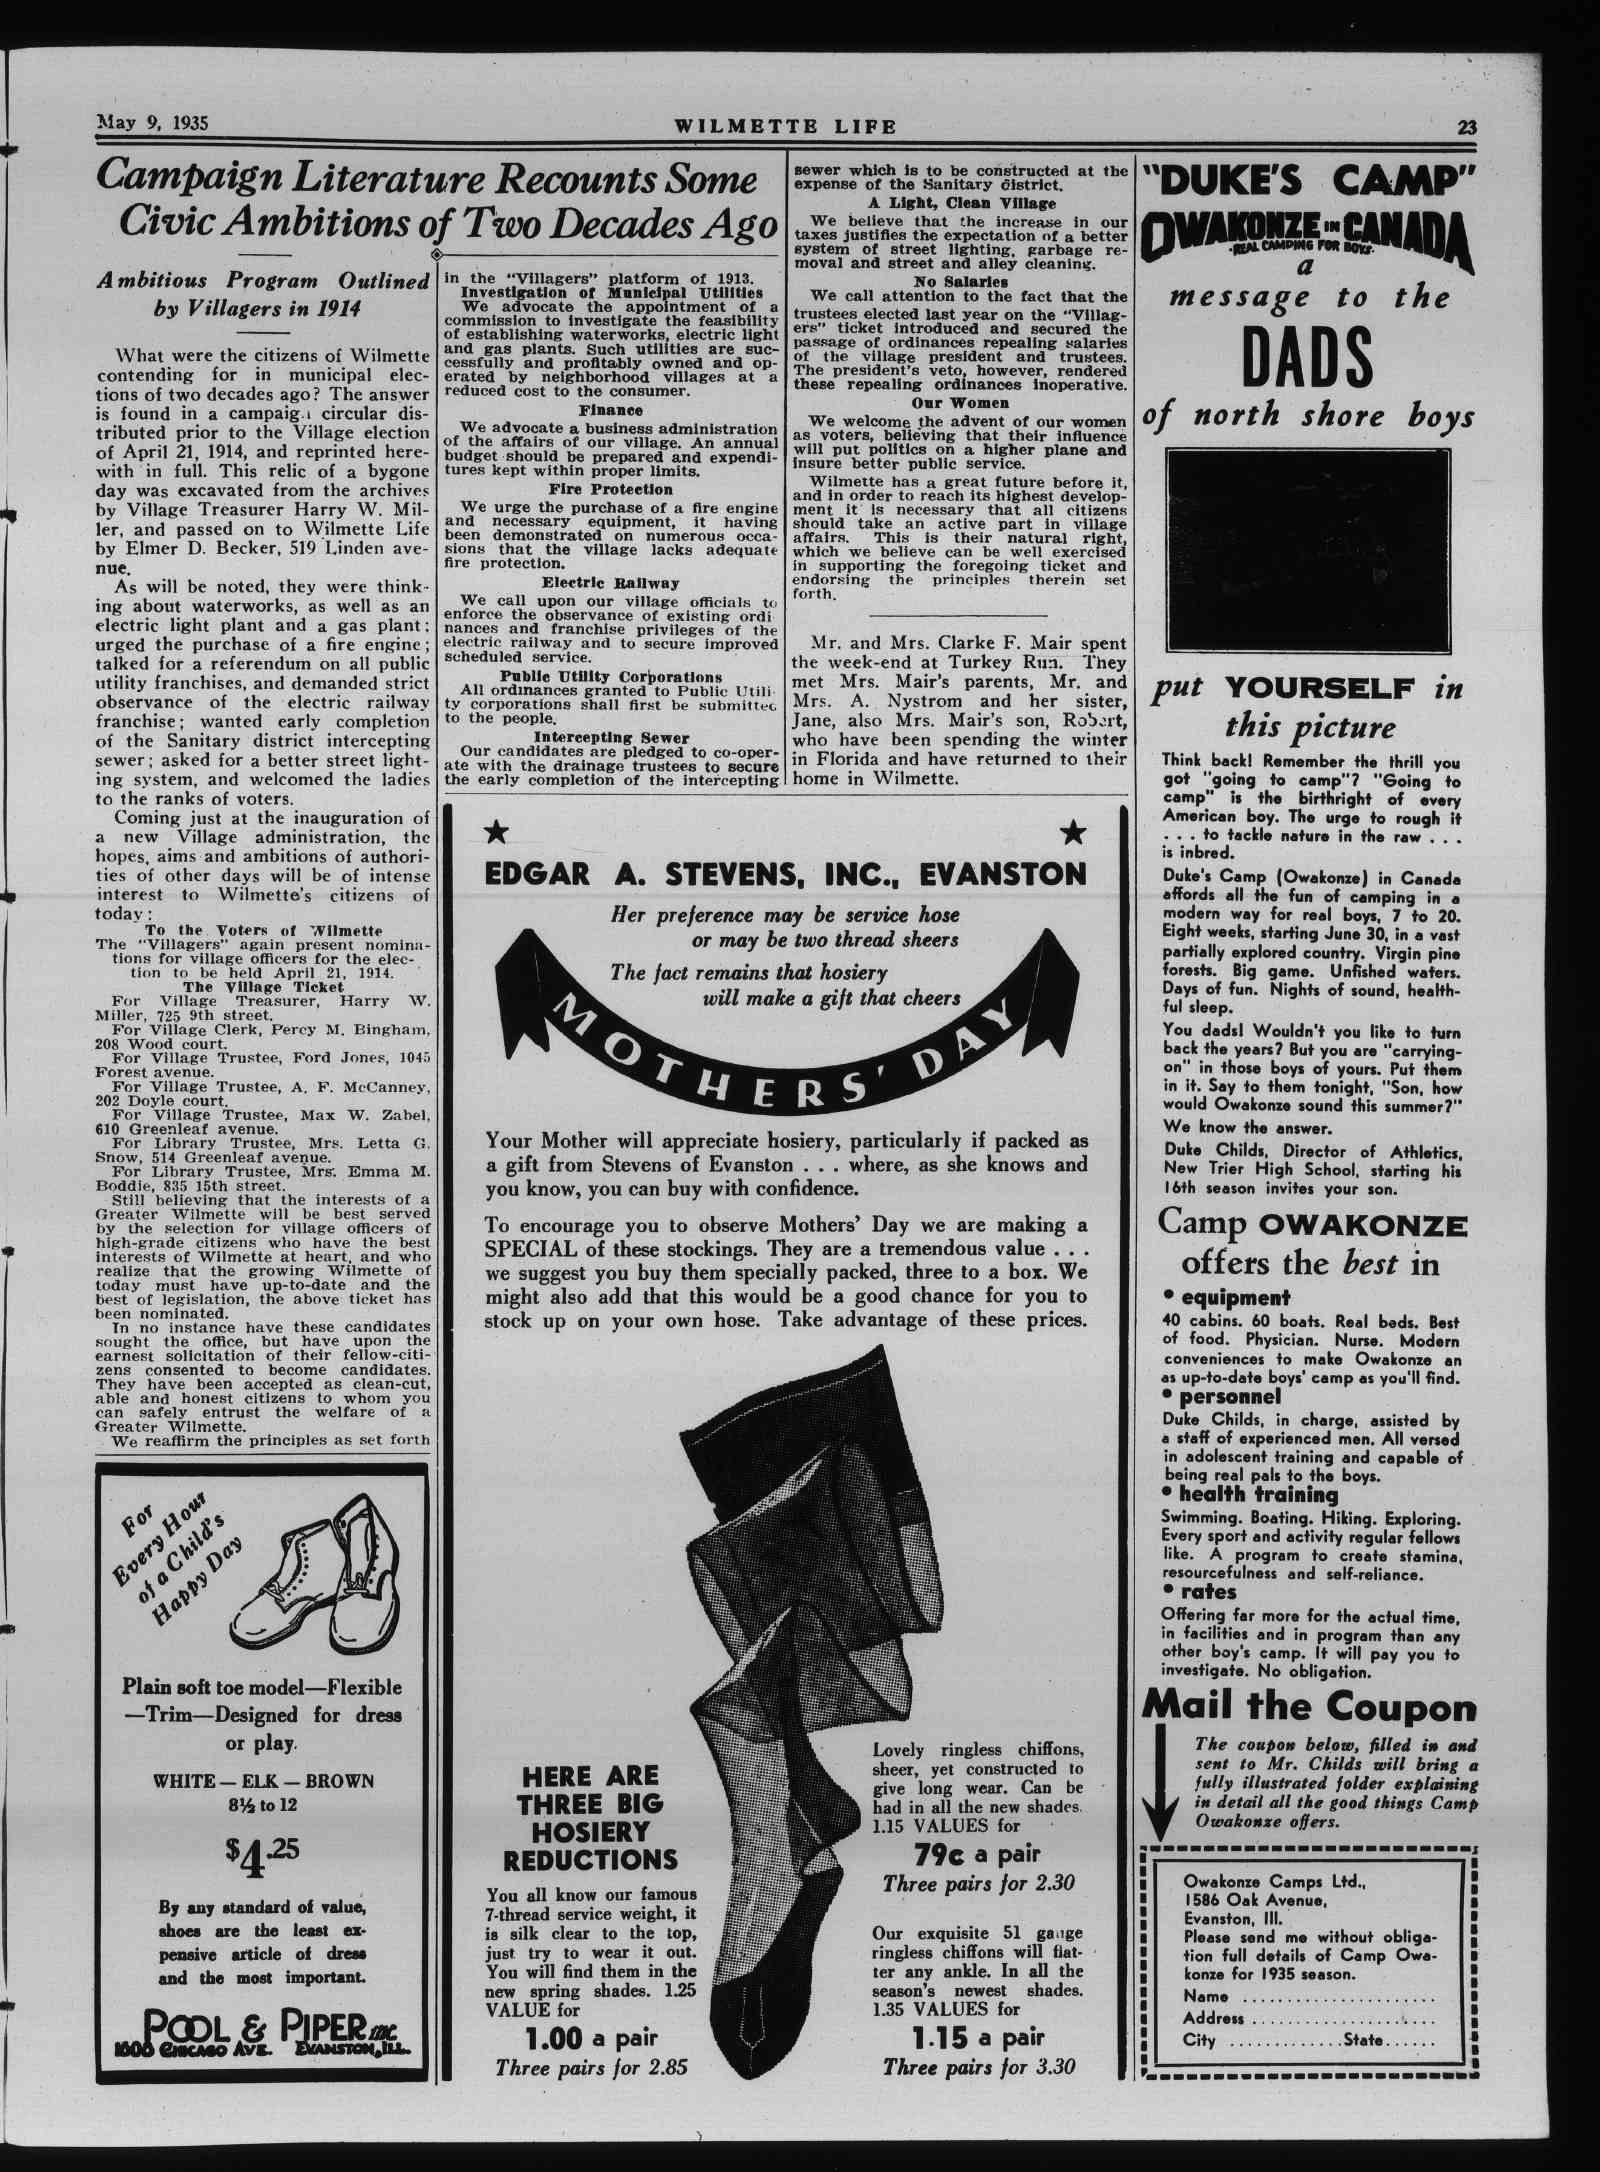 Wilmette Life (Wilmette, Illinois), 9 May 1935